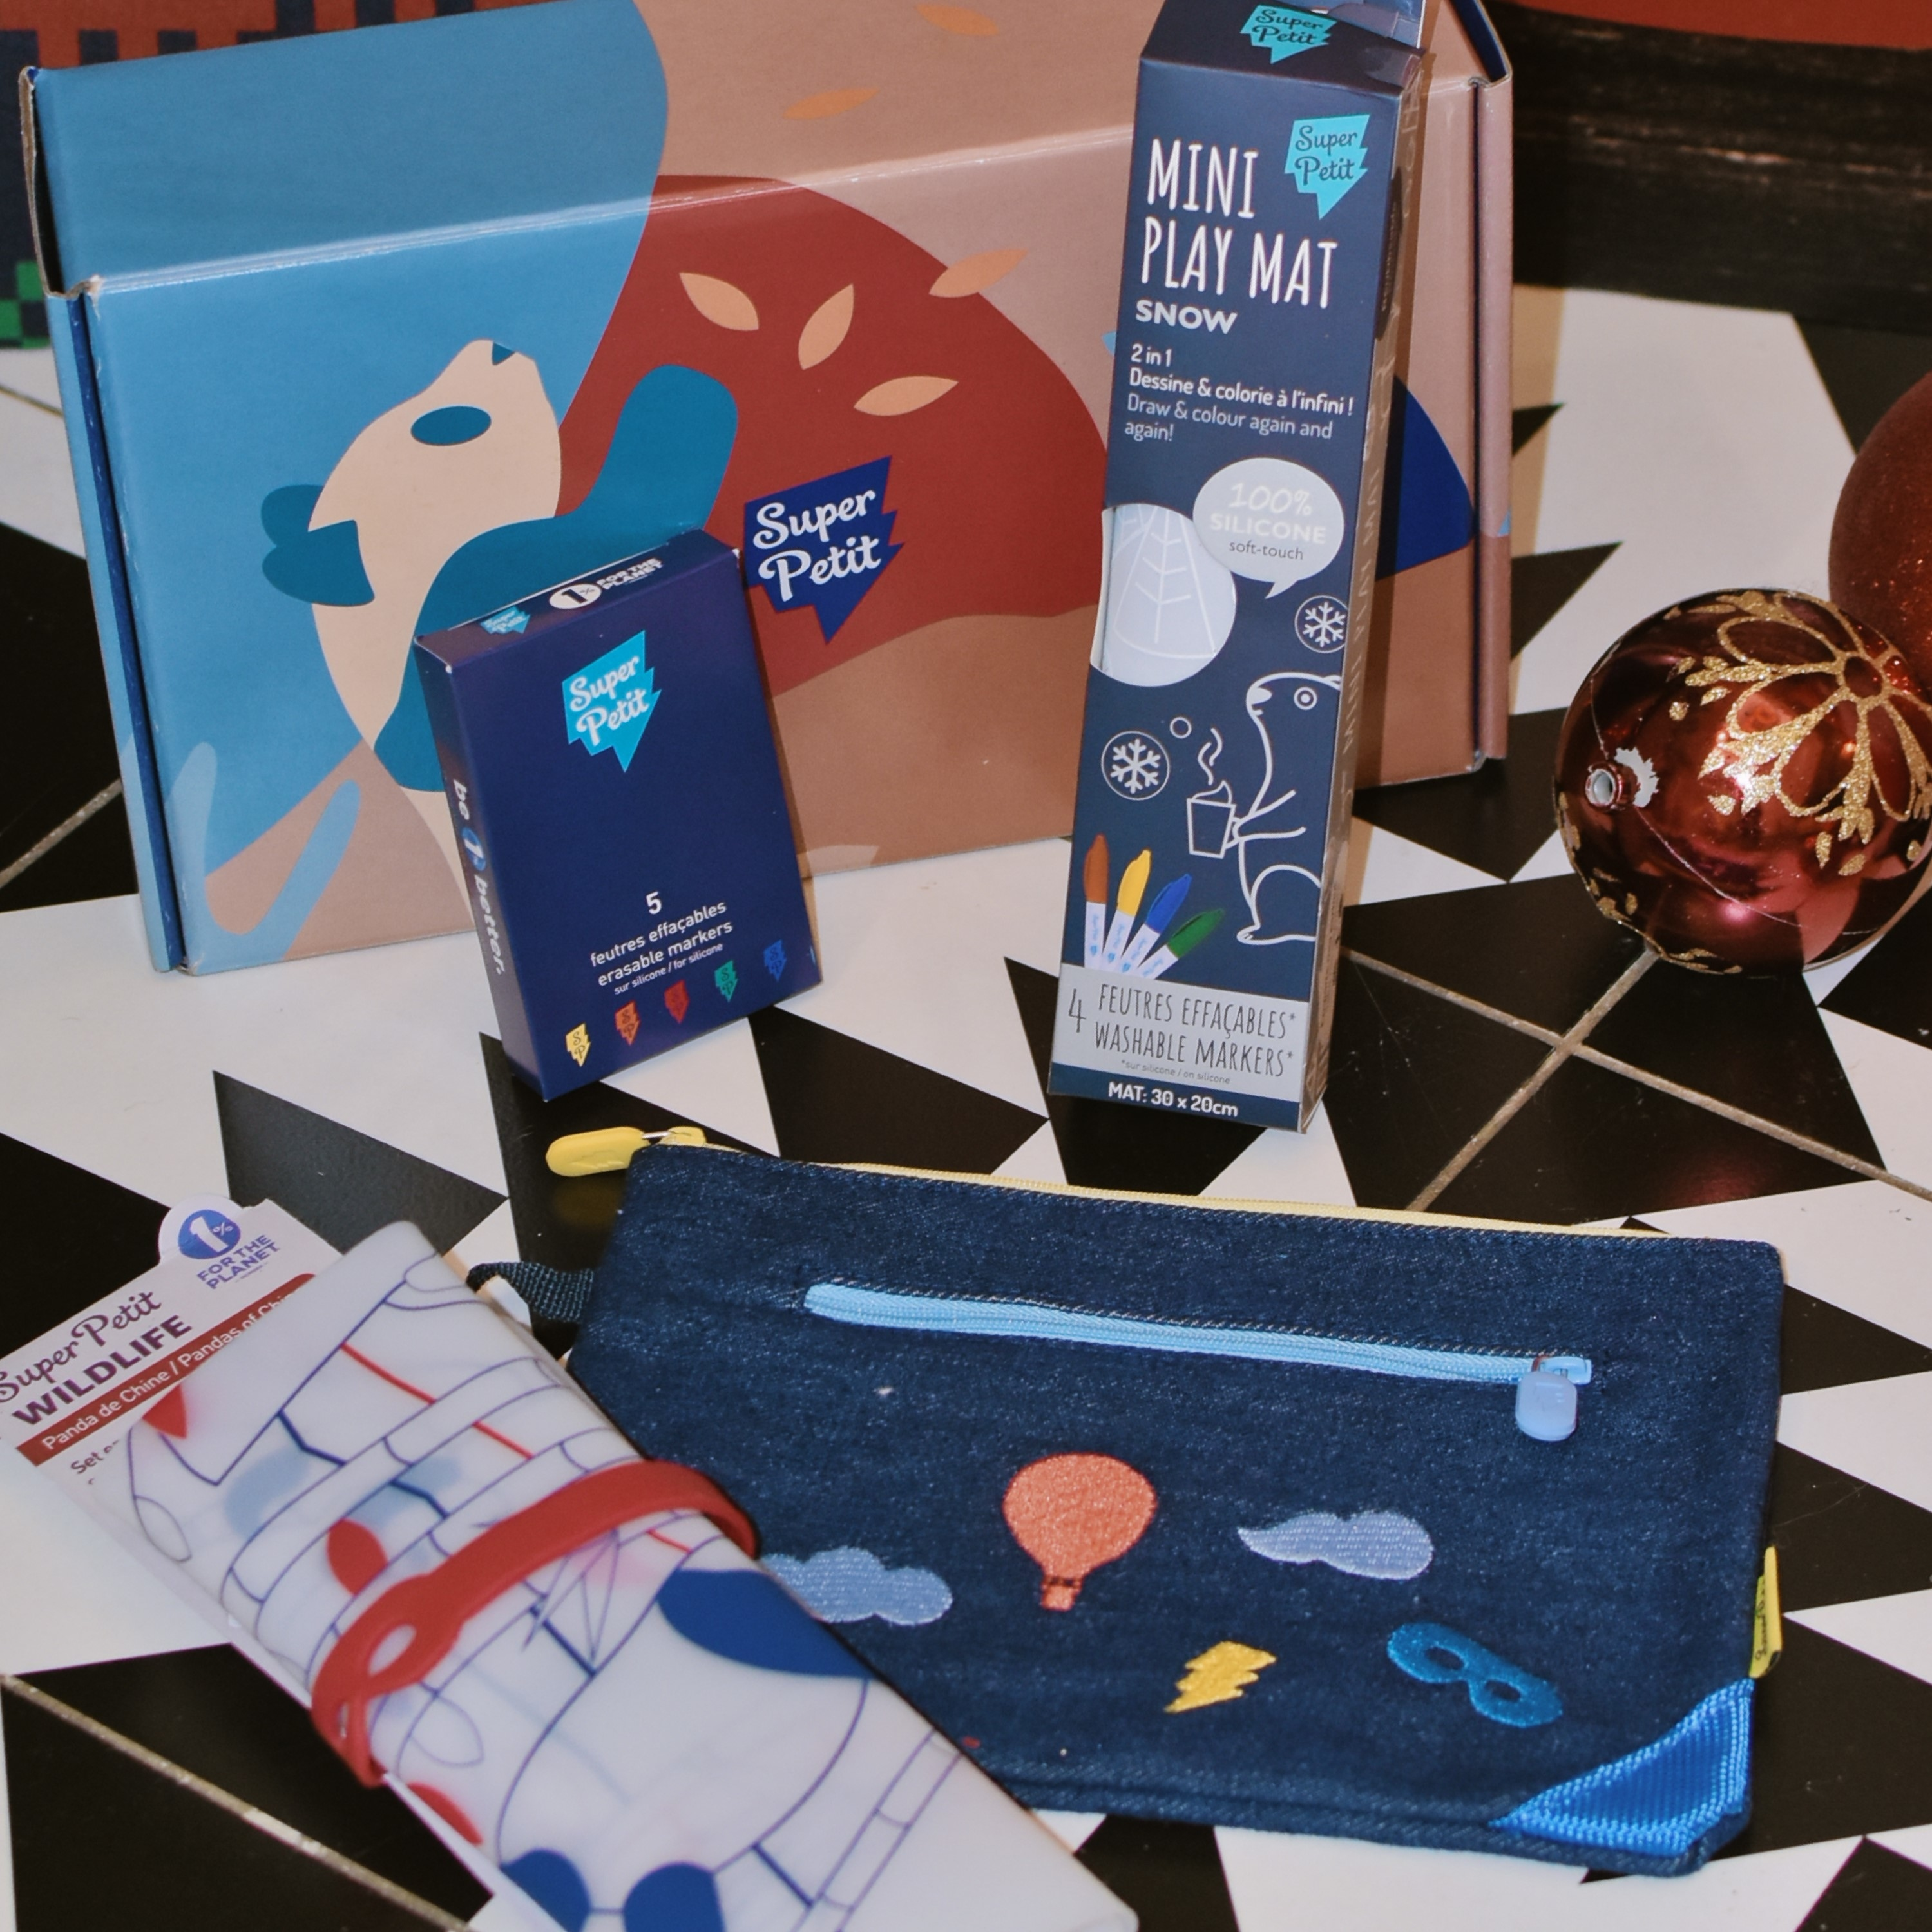 SuperPetit 彩繪餐墊禮盒組, xmas bundle, xmas giftbox, giftbox, superpetit, 彩繪餐墊